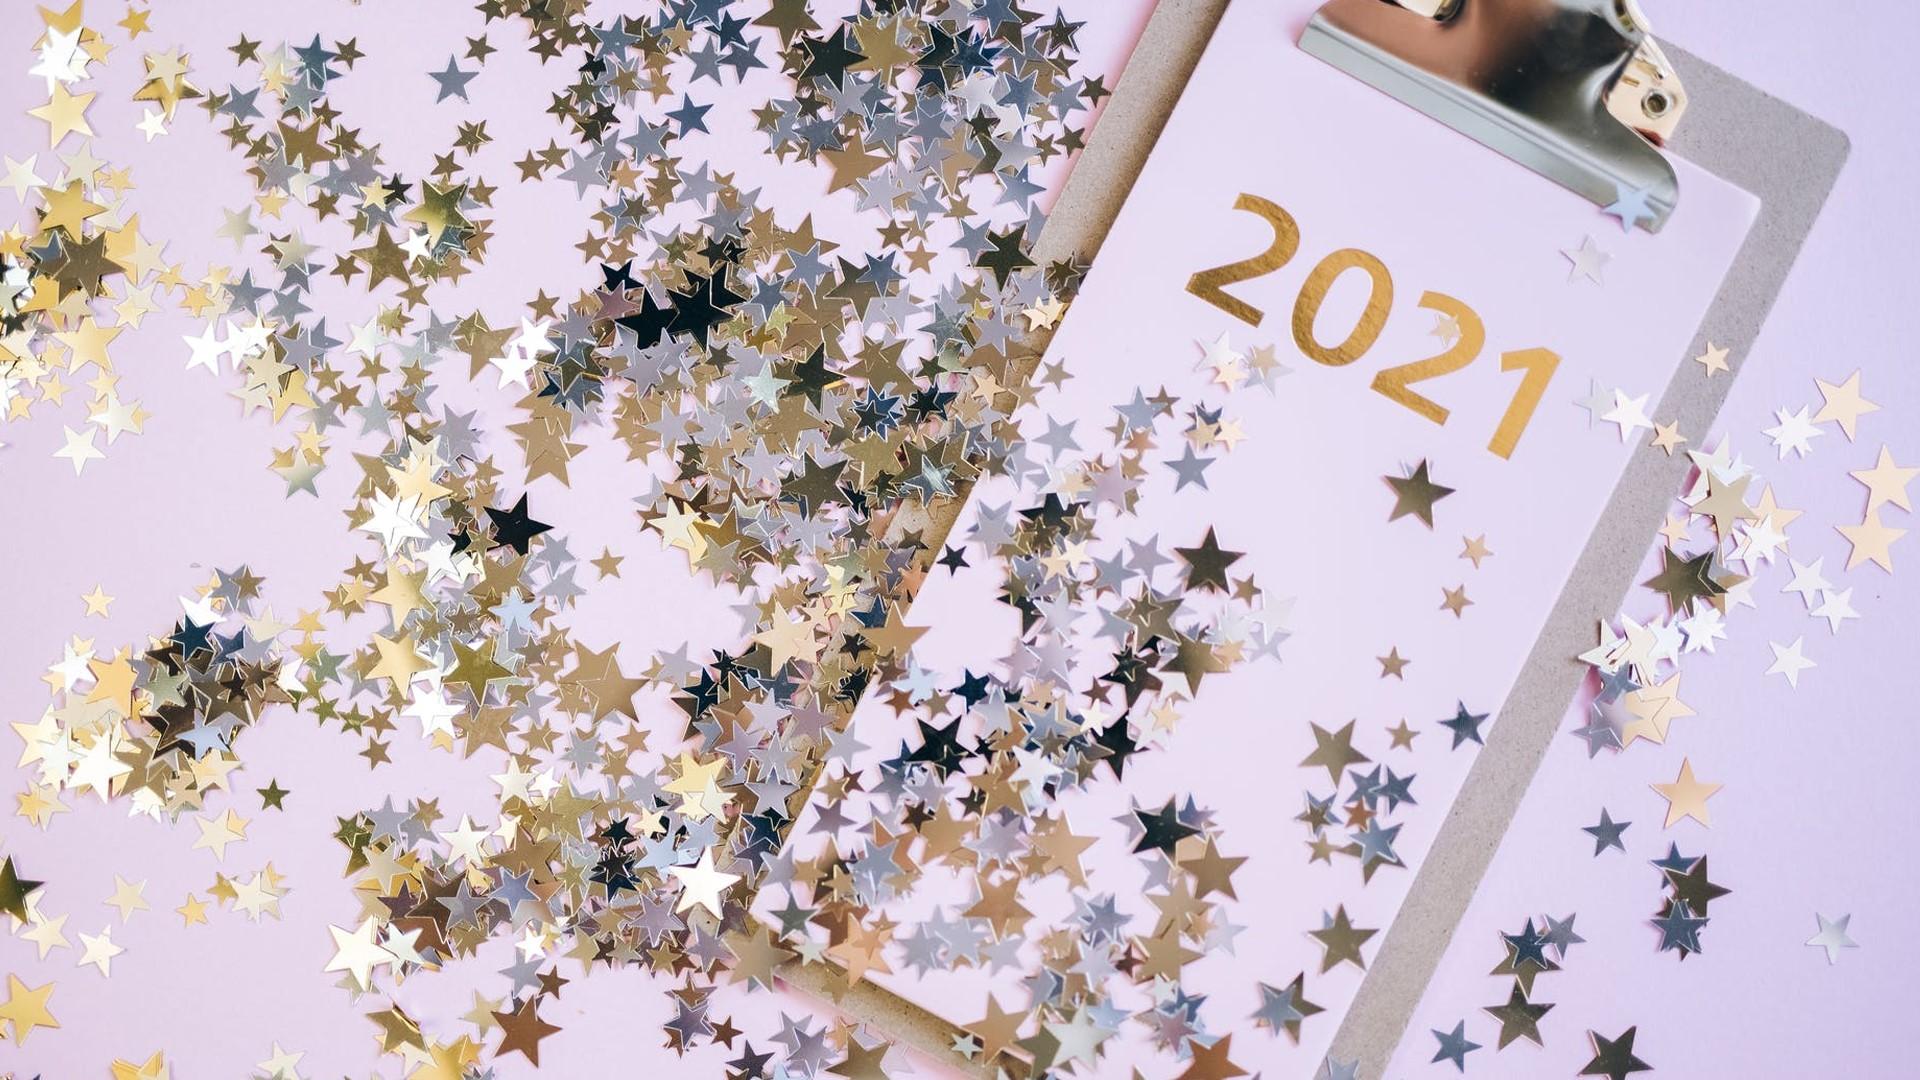 Eburon Hotel - Nieuwjaarsarrangement